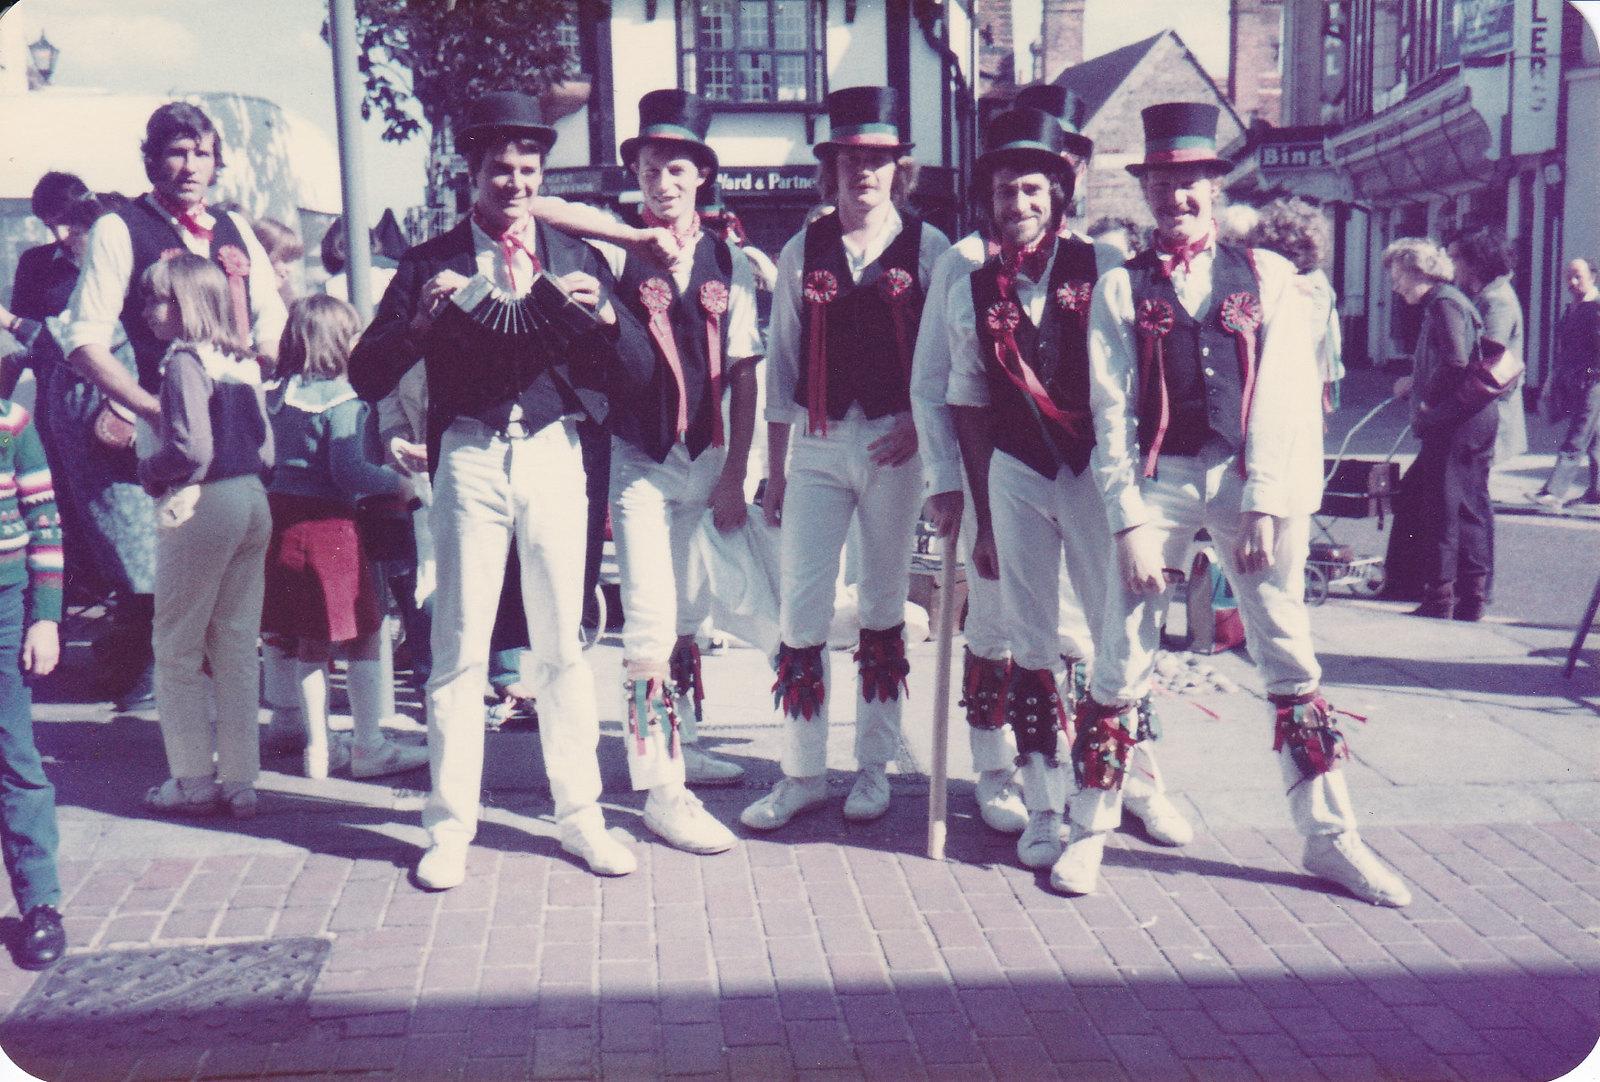 Oyster Morris Squire's Tour, Faversham, 1983